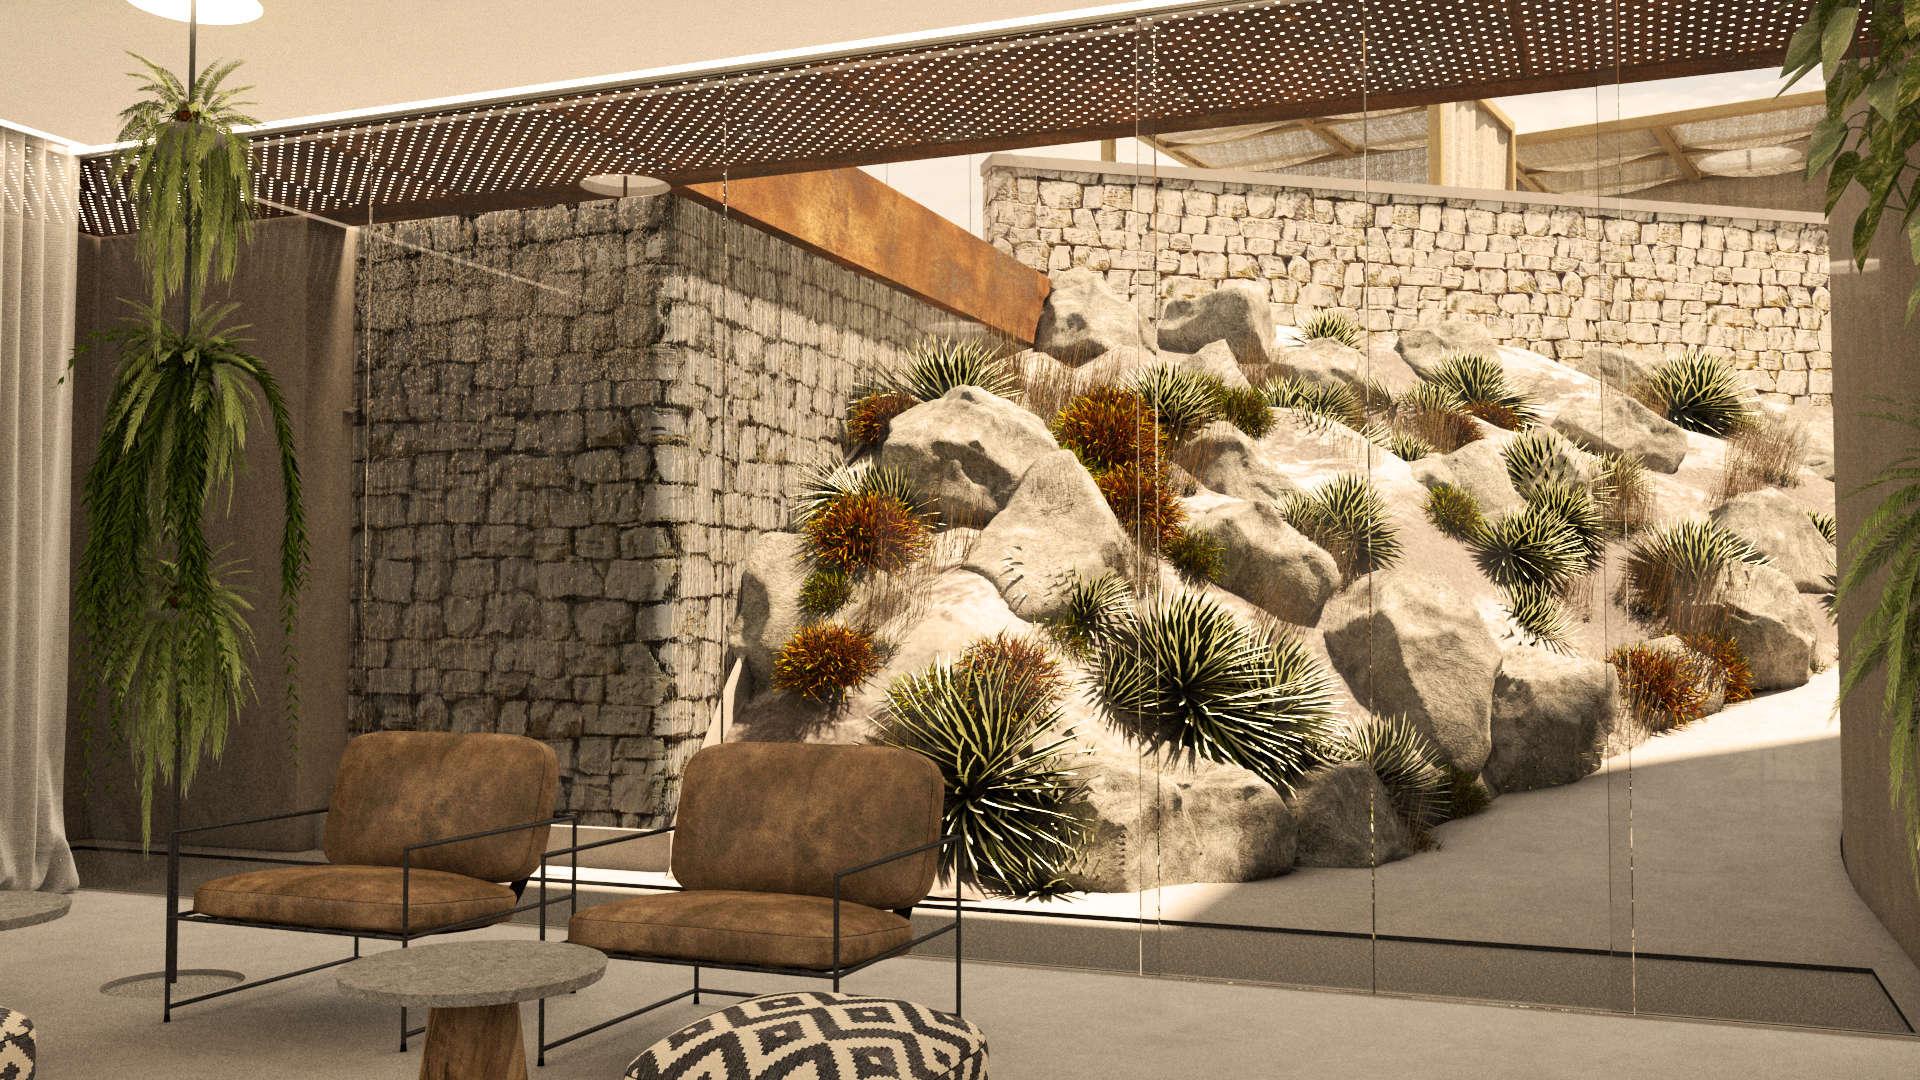 Hotel lobby interior design, rocky landscape. Αίθουσα αναμονής του ξενοδοχείου. Βραχώδες τοπίο.